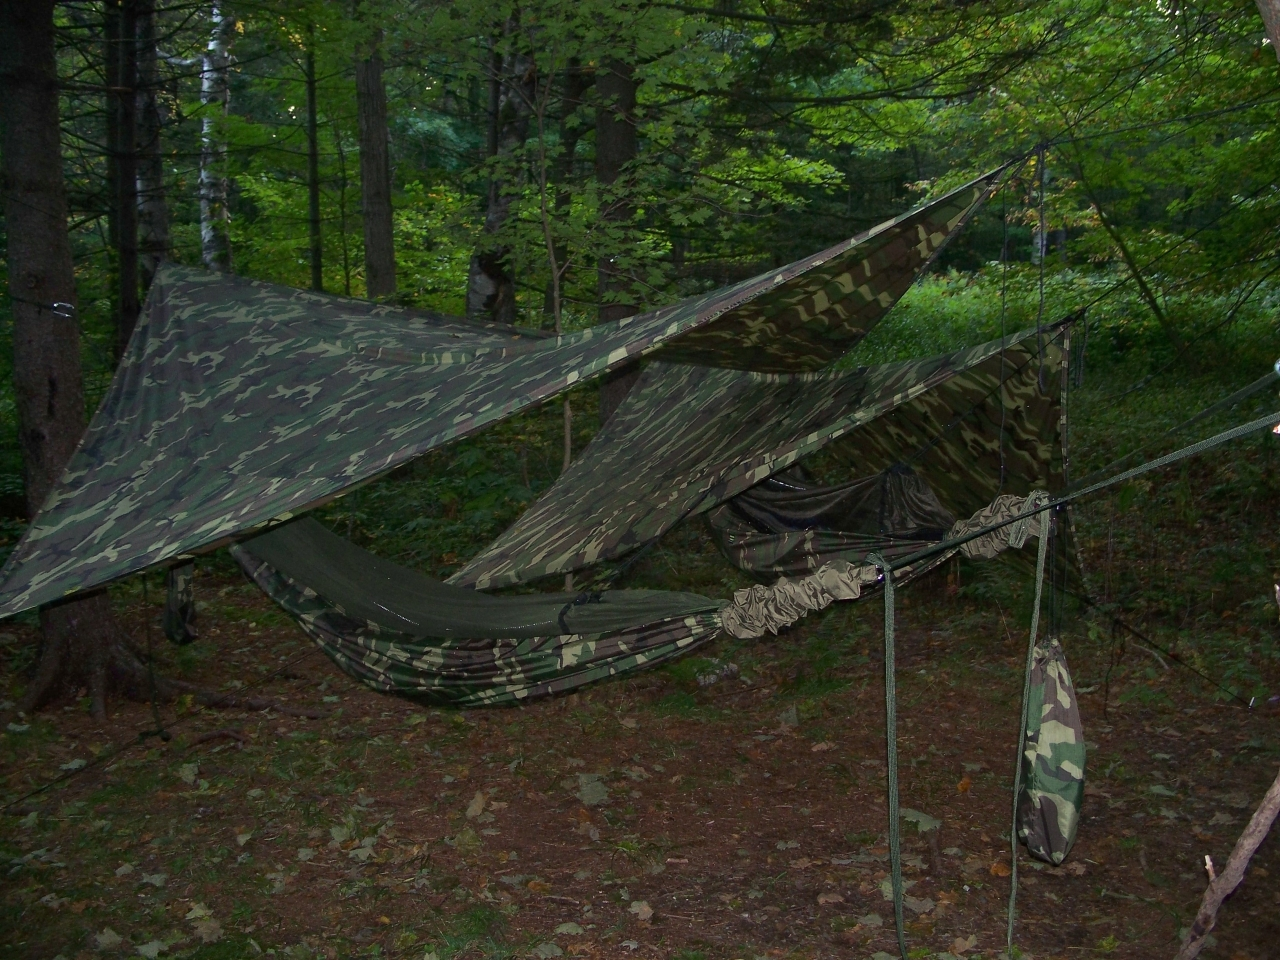 Triangle Hammock Setup